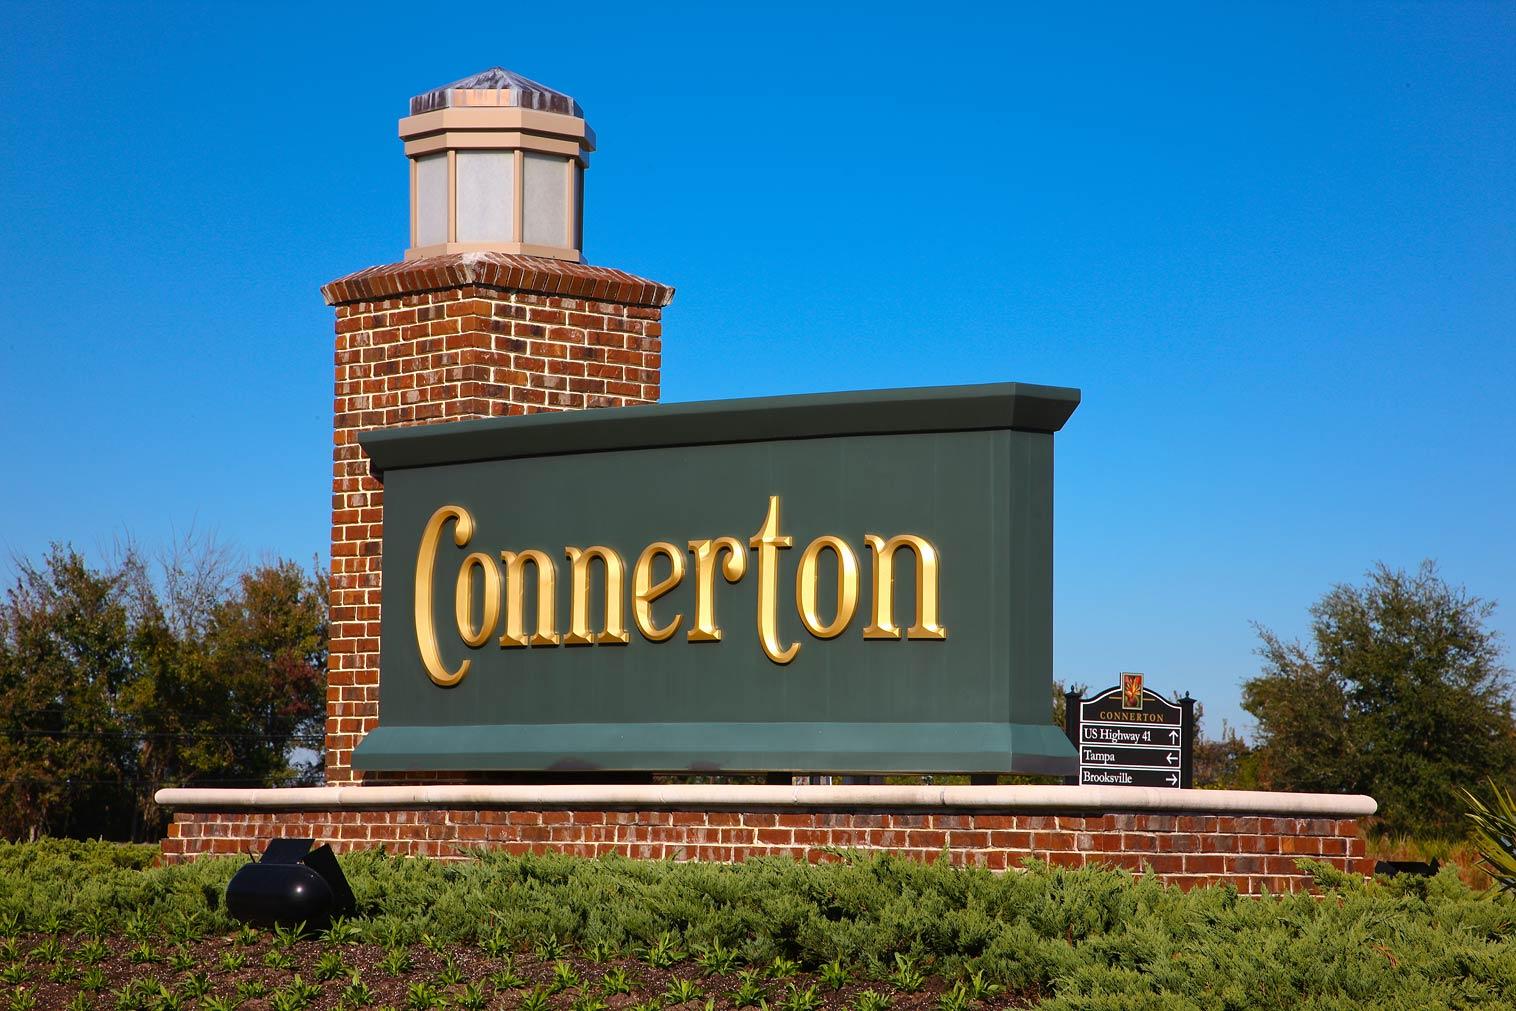 connerton.jpg